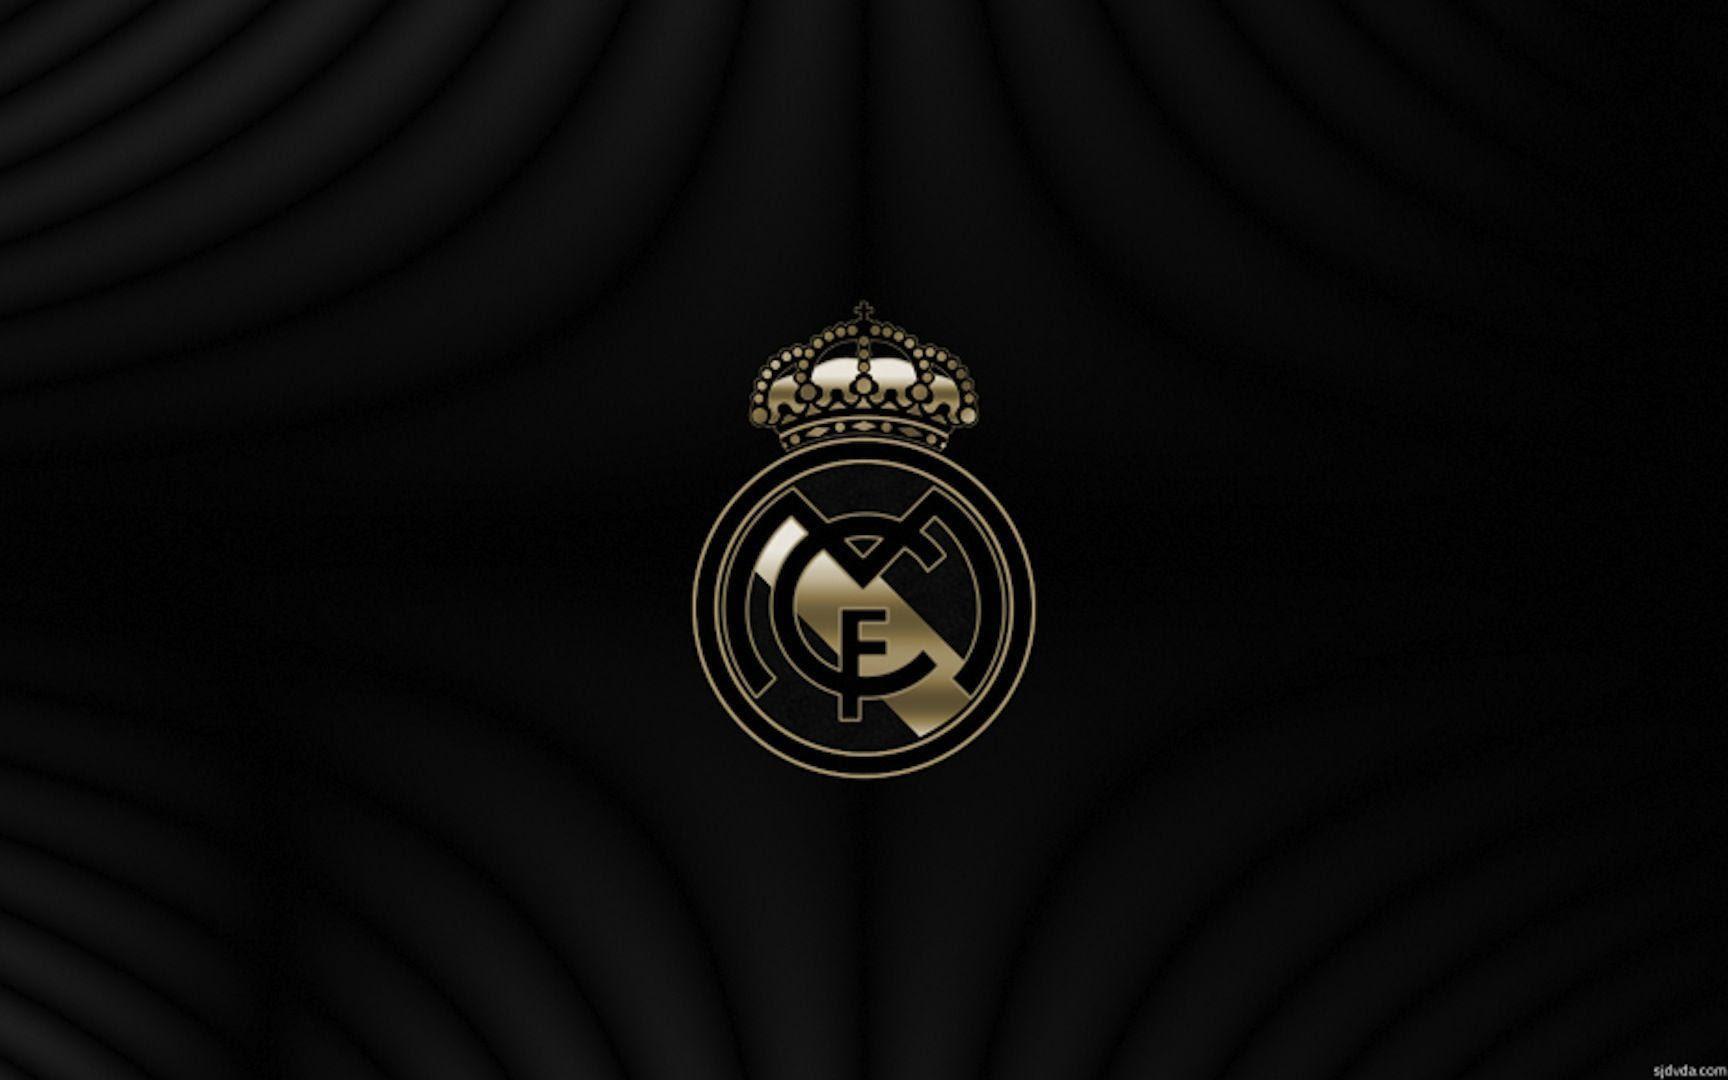 Real Madrid Wallpapers Full Hd 2017 Wallpaper Cave